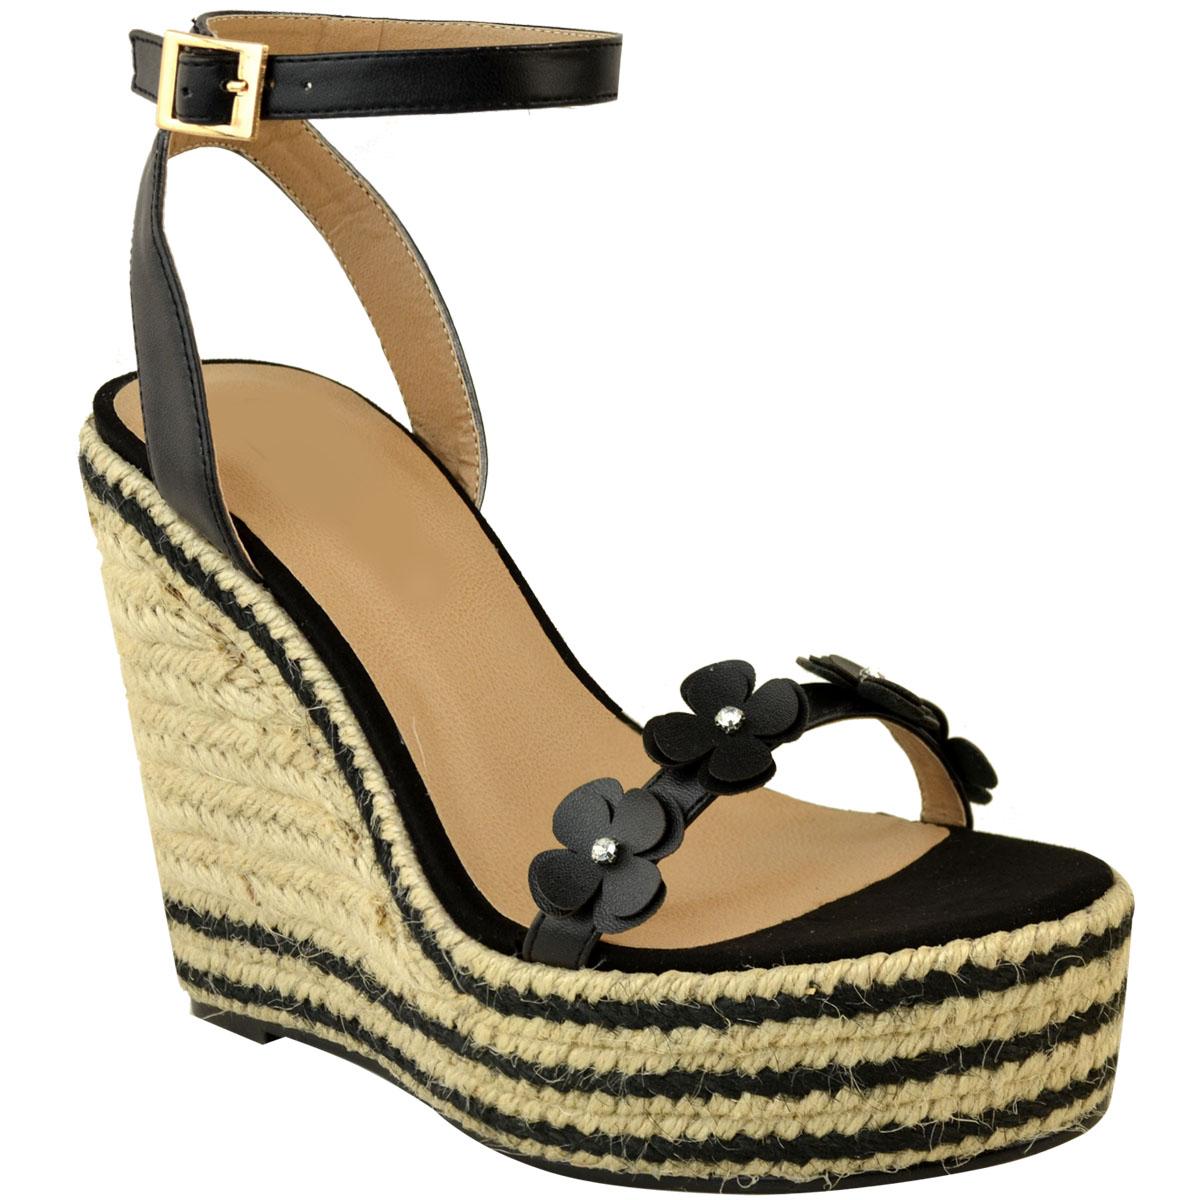 9f7f7400a9c Womens Ladies Summer Wedge Low High Heel Sandals Platform ...